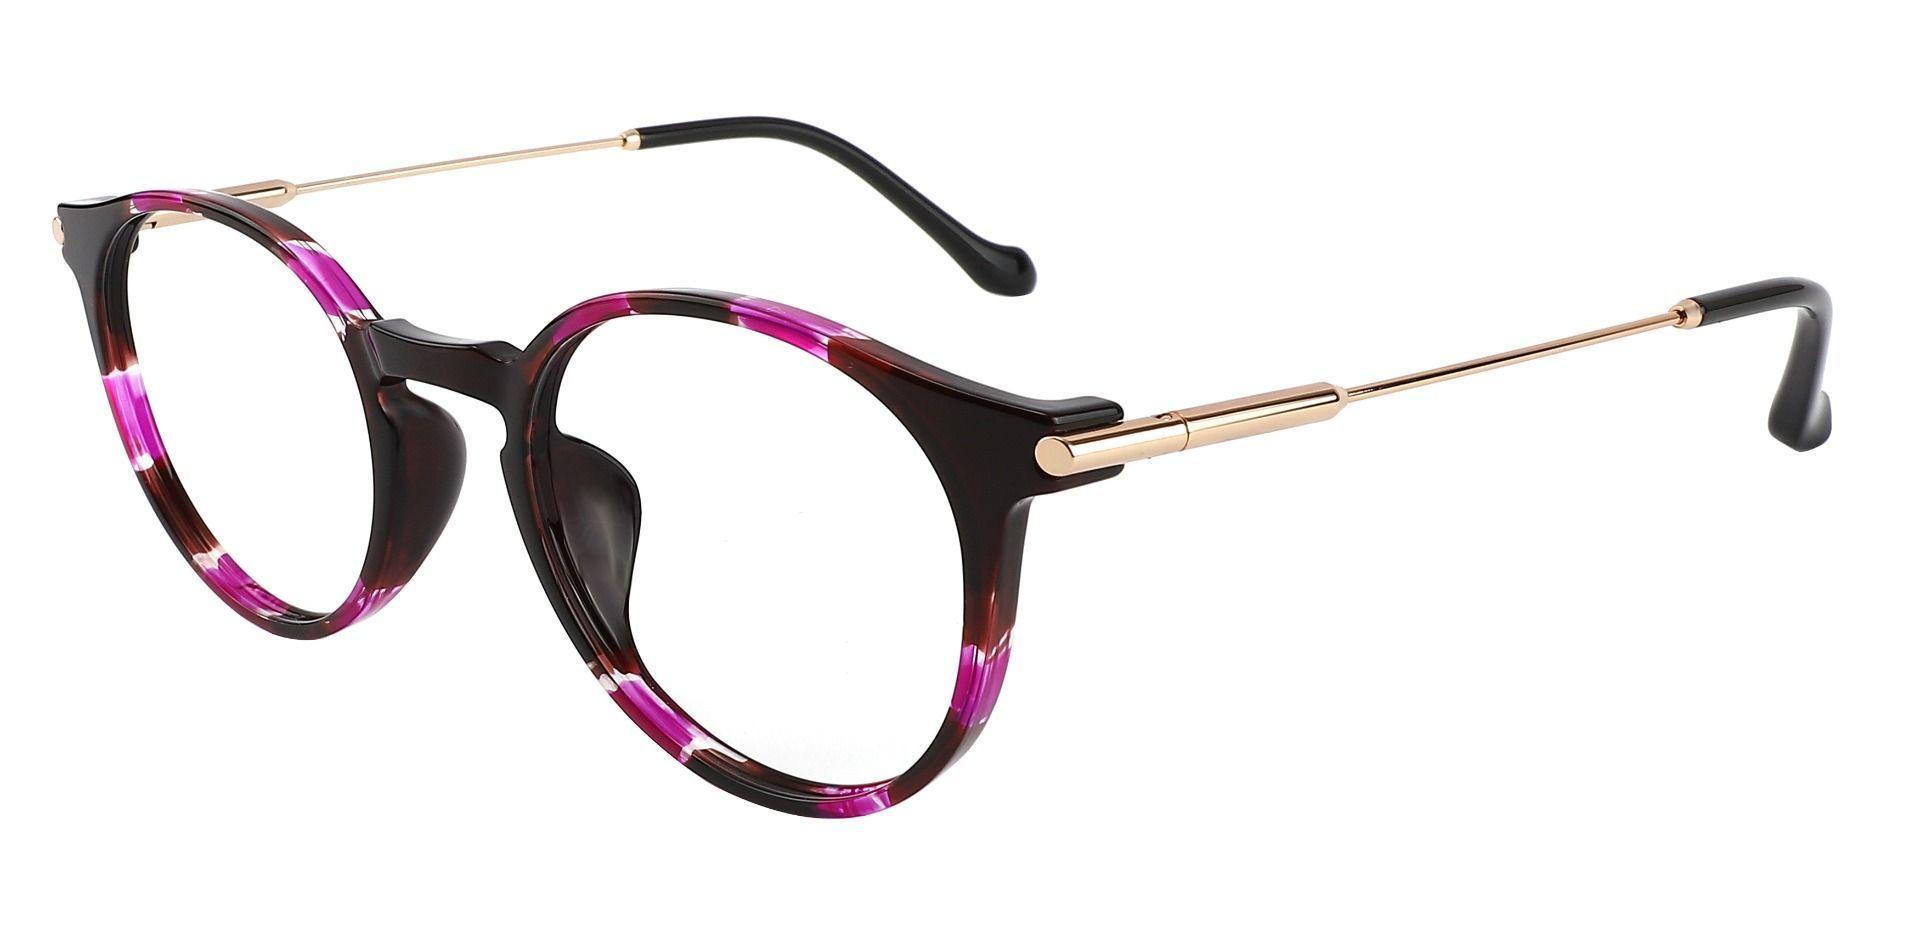 Hallie Round Lined Bifocal Glasses - Purple